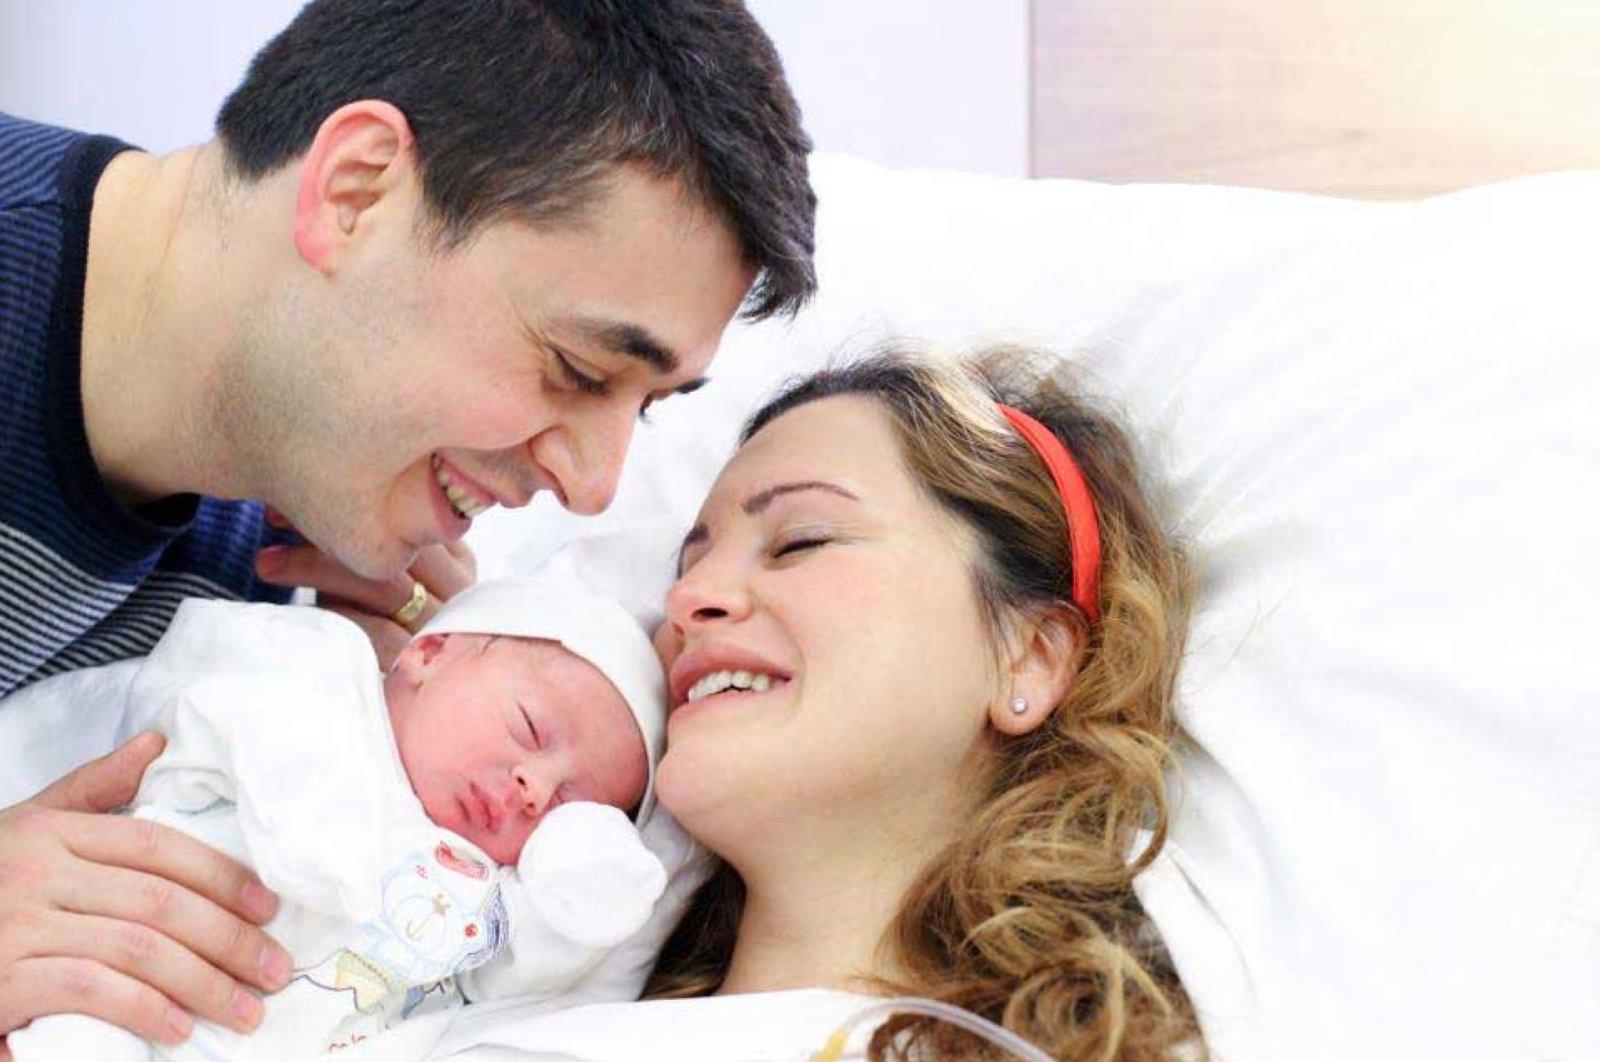 Turkish fertility drops sharply